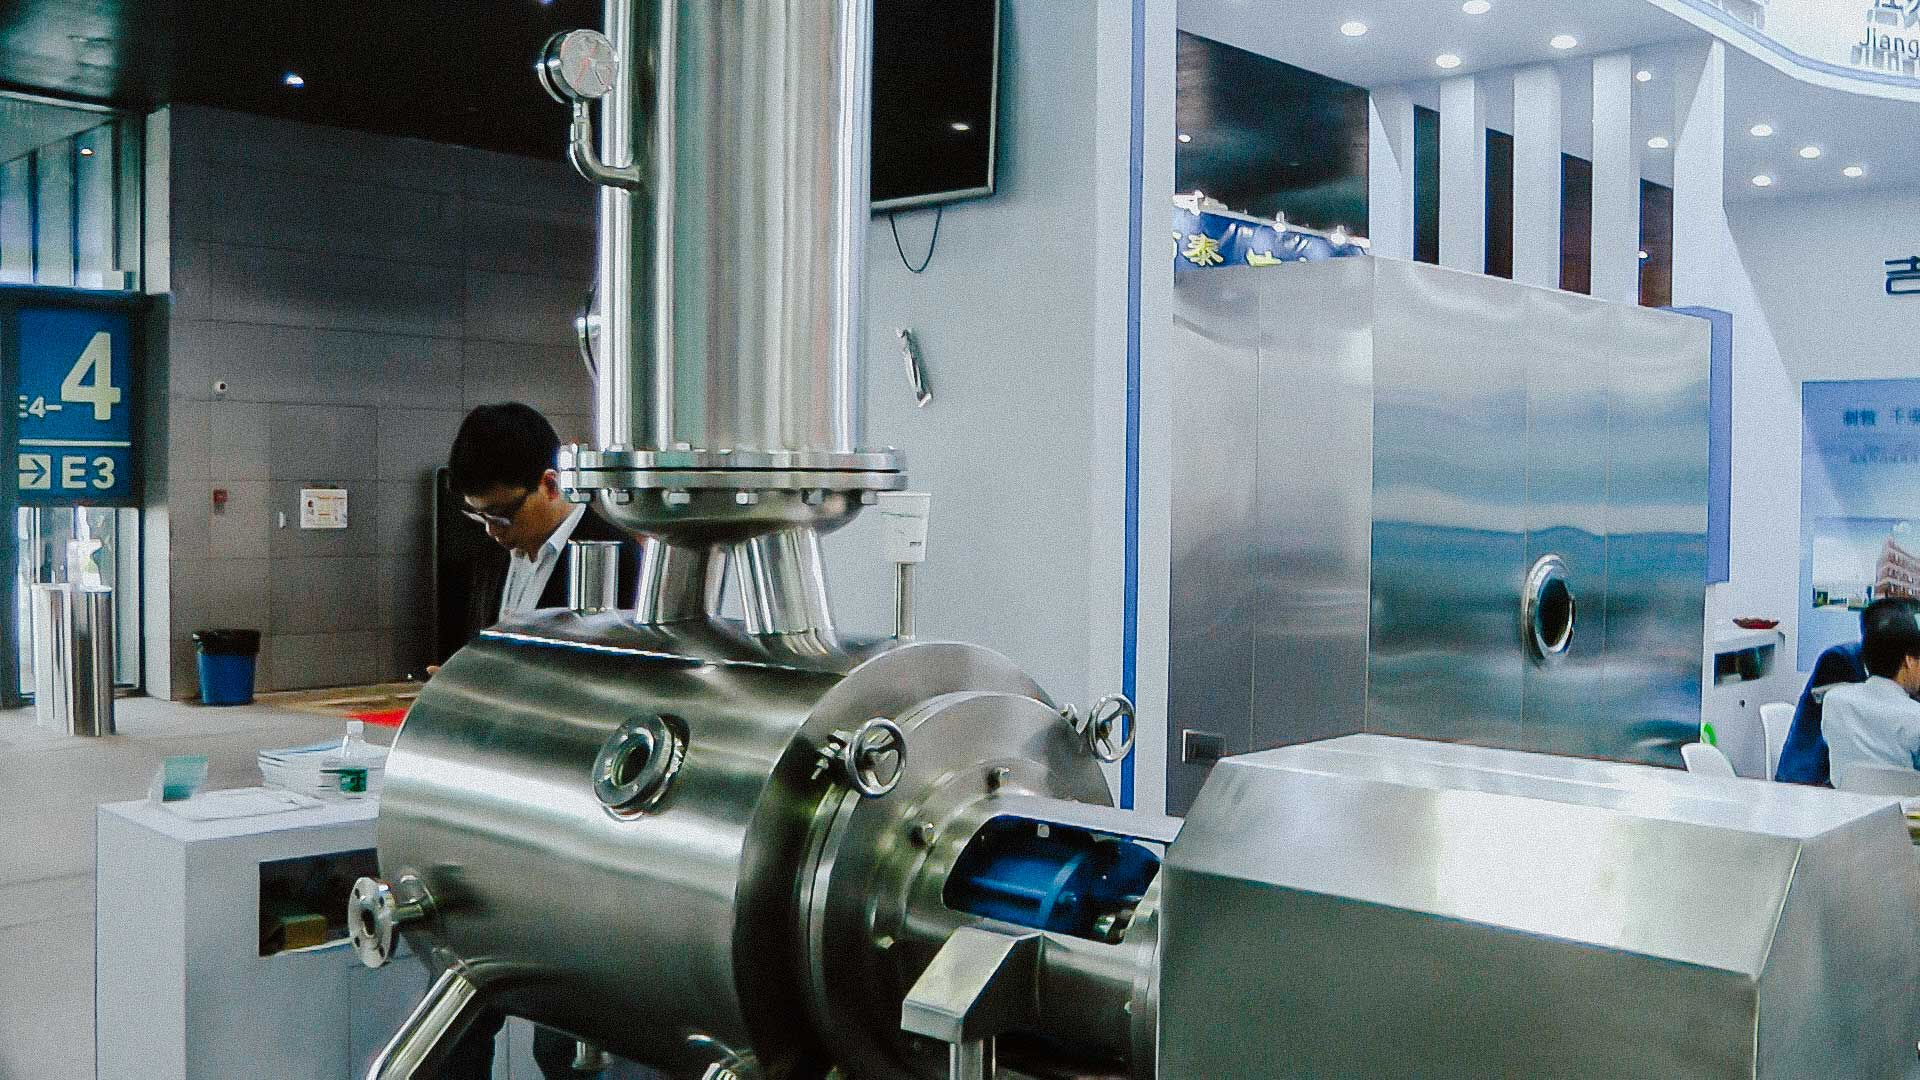 Equipment for pharmaceutical preparation of liquids for drug production